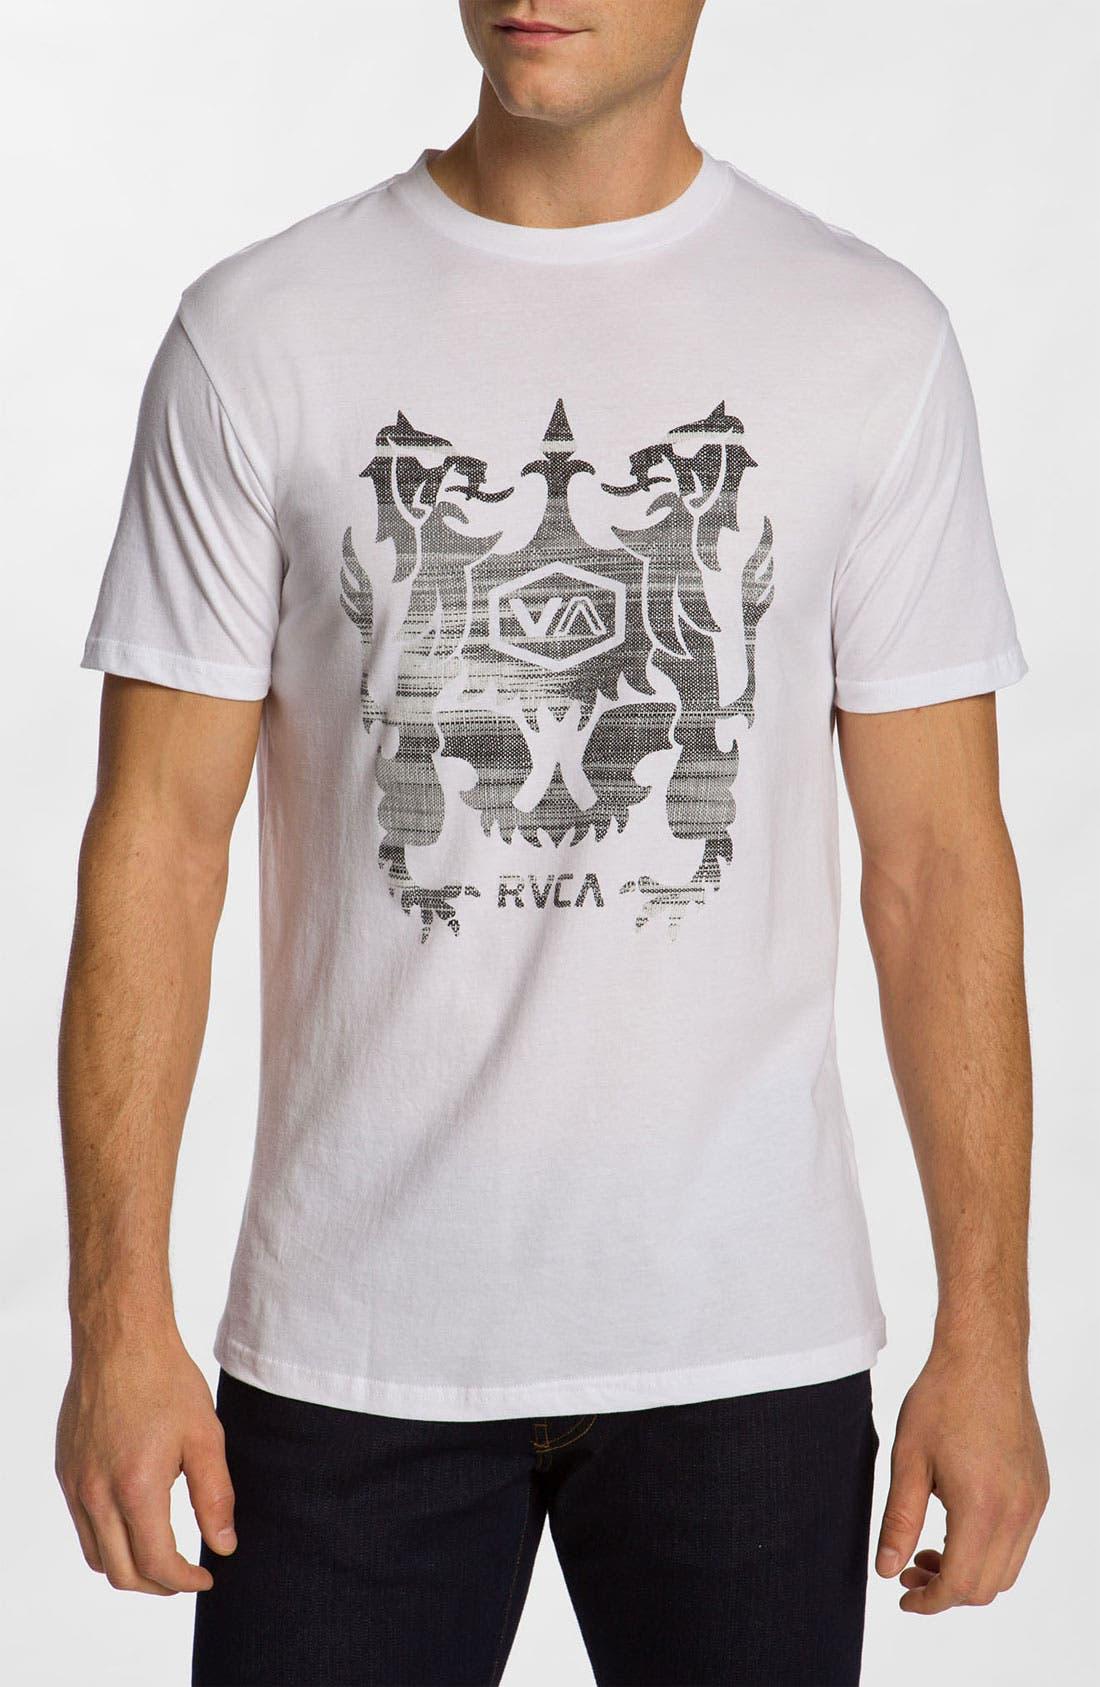 Main Image - RVCA 'Eecat Crest' T-Shirt